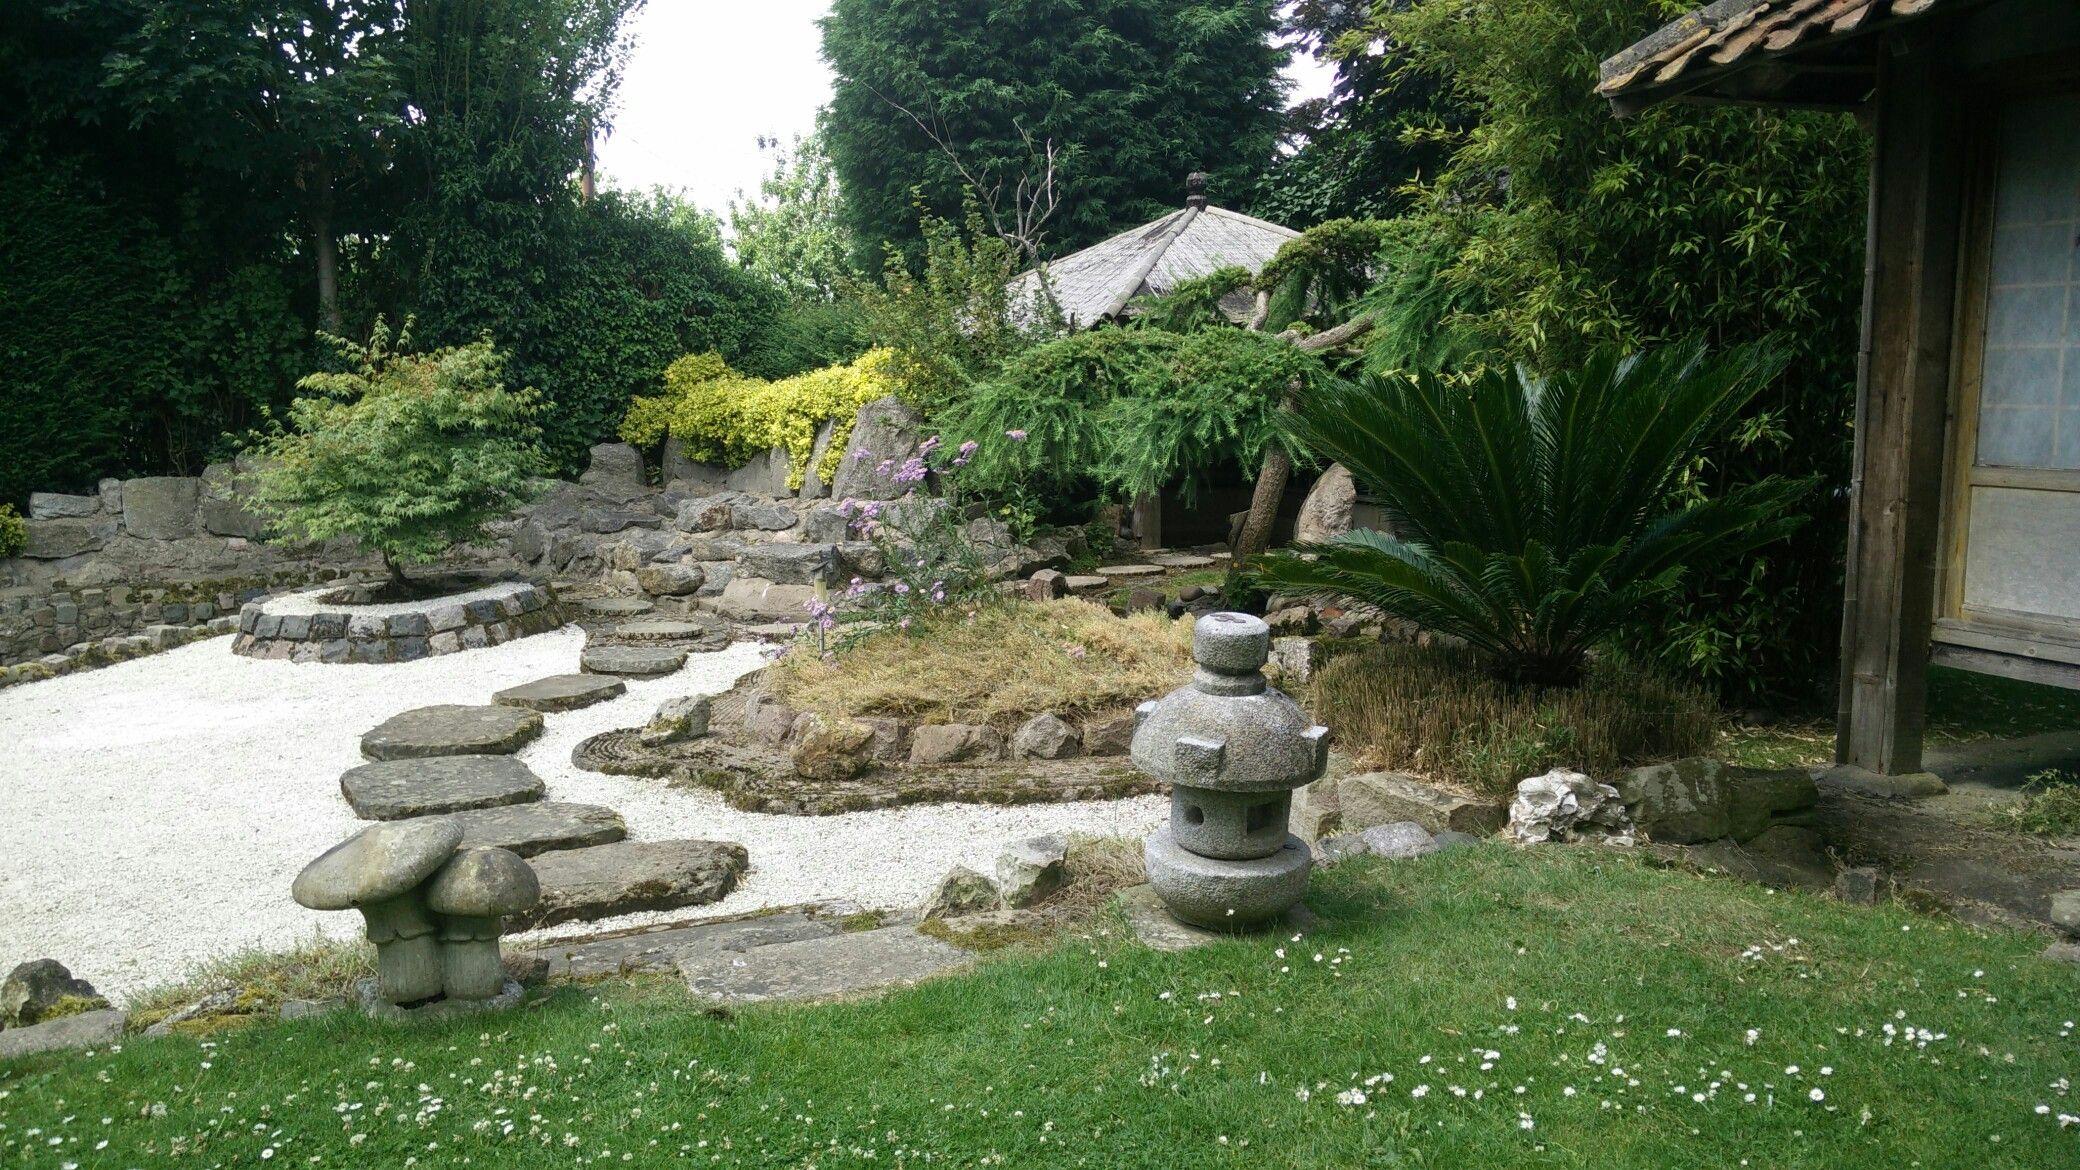 The Zen Garden At Pure Land Japanese Garden, Near Newark